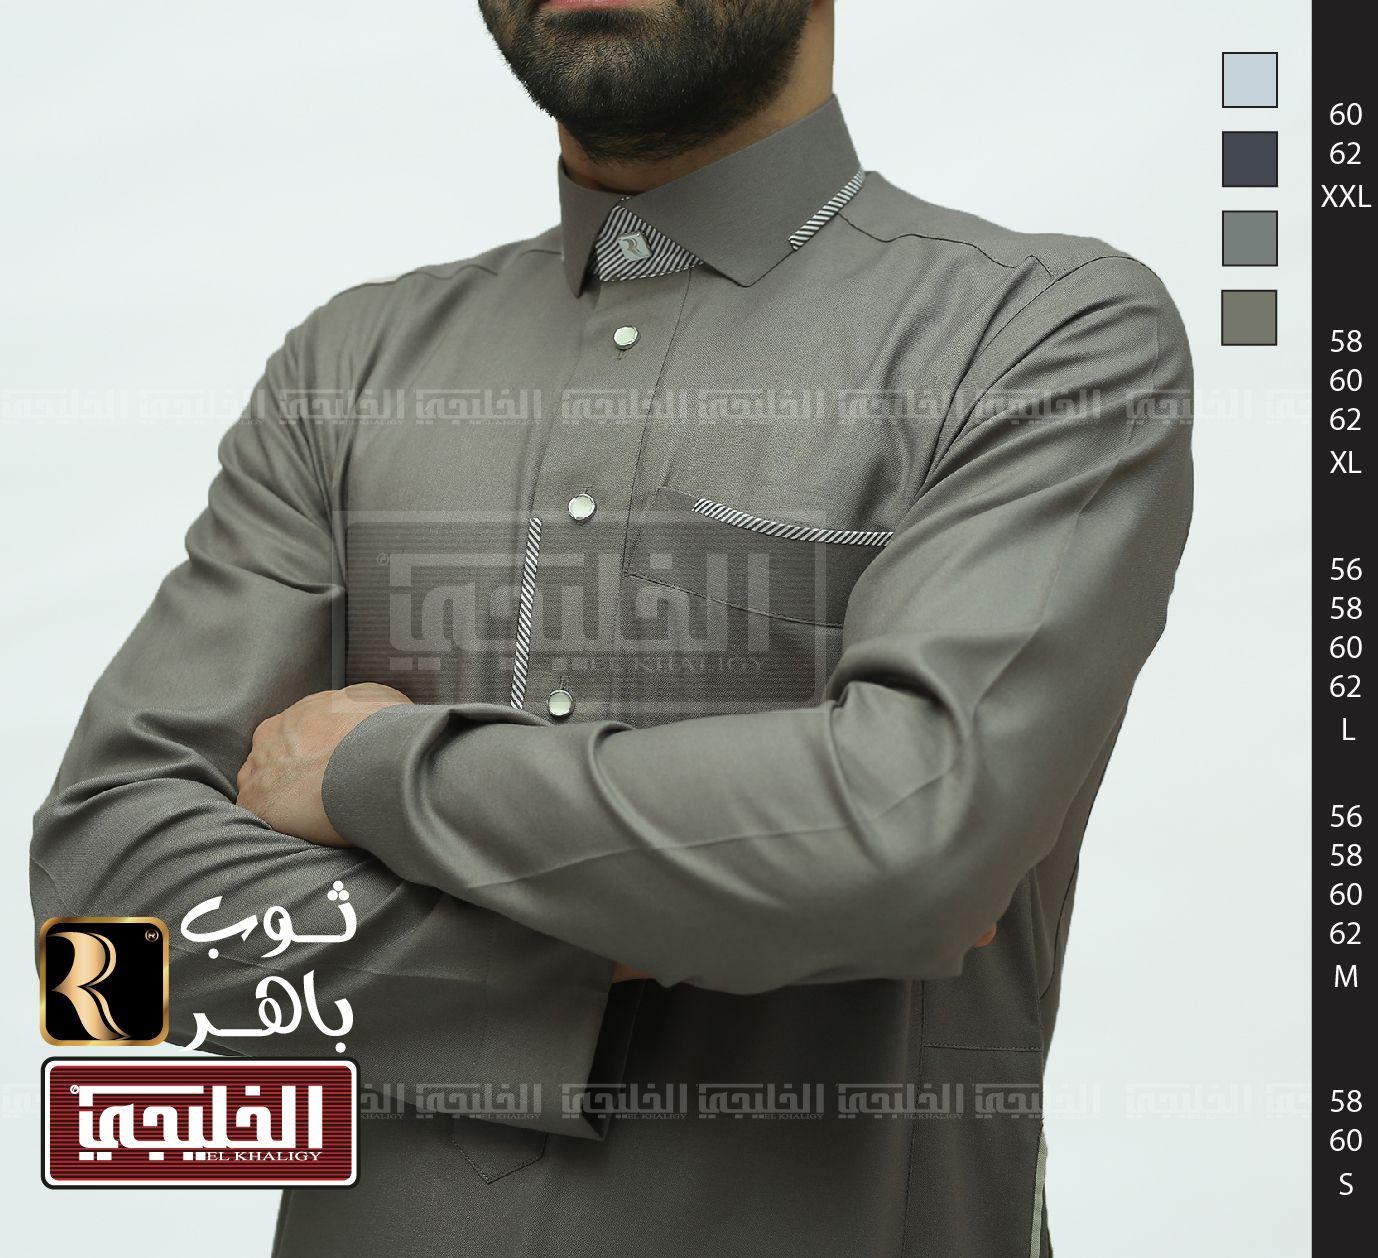 ثوب باهر Mens Tops Shirts Xxl